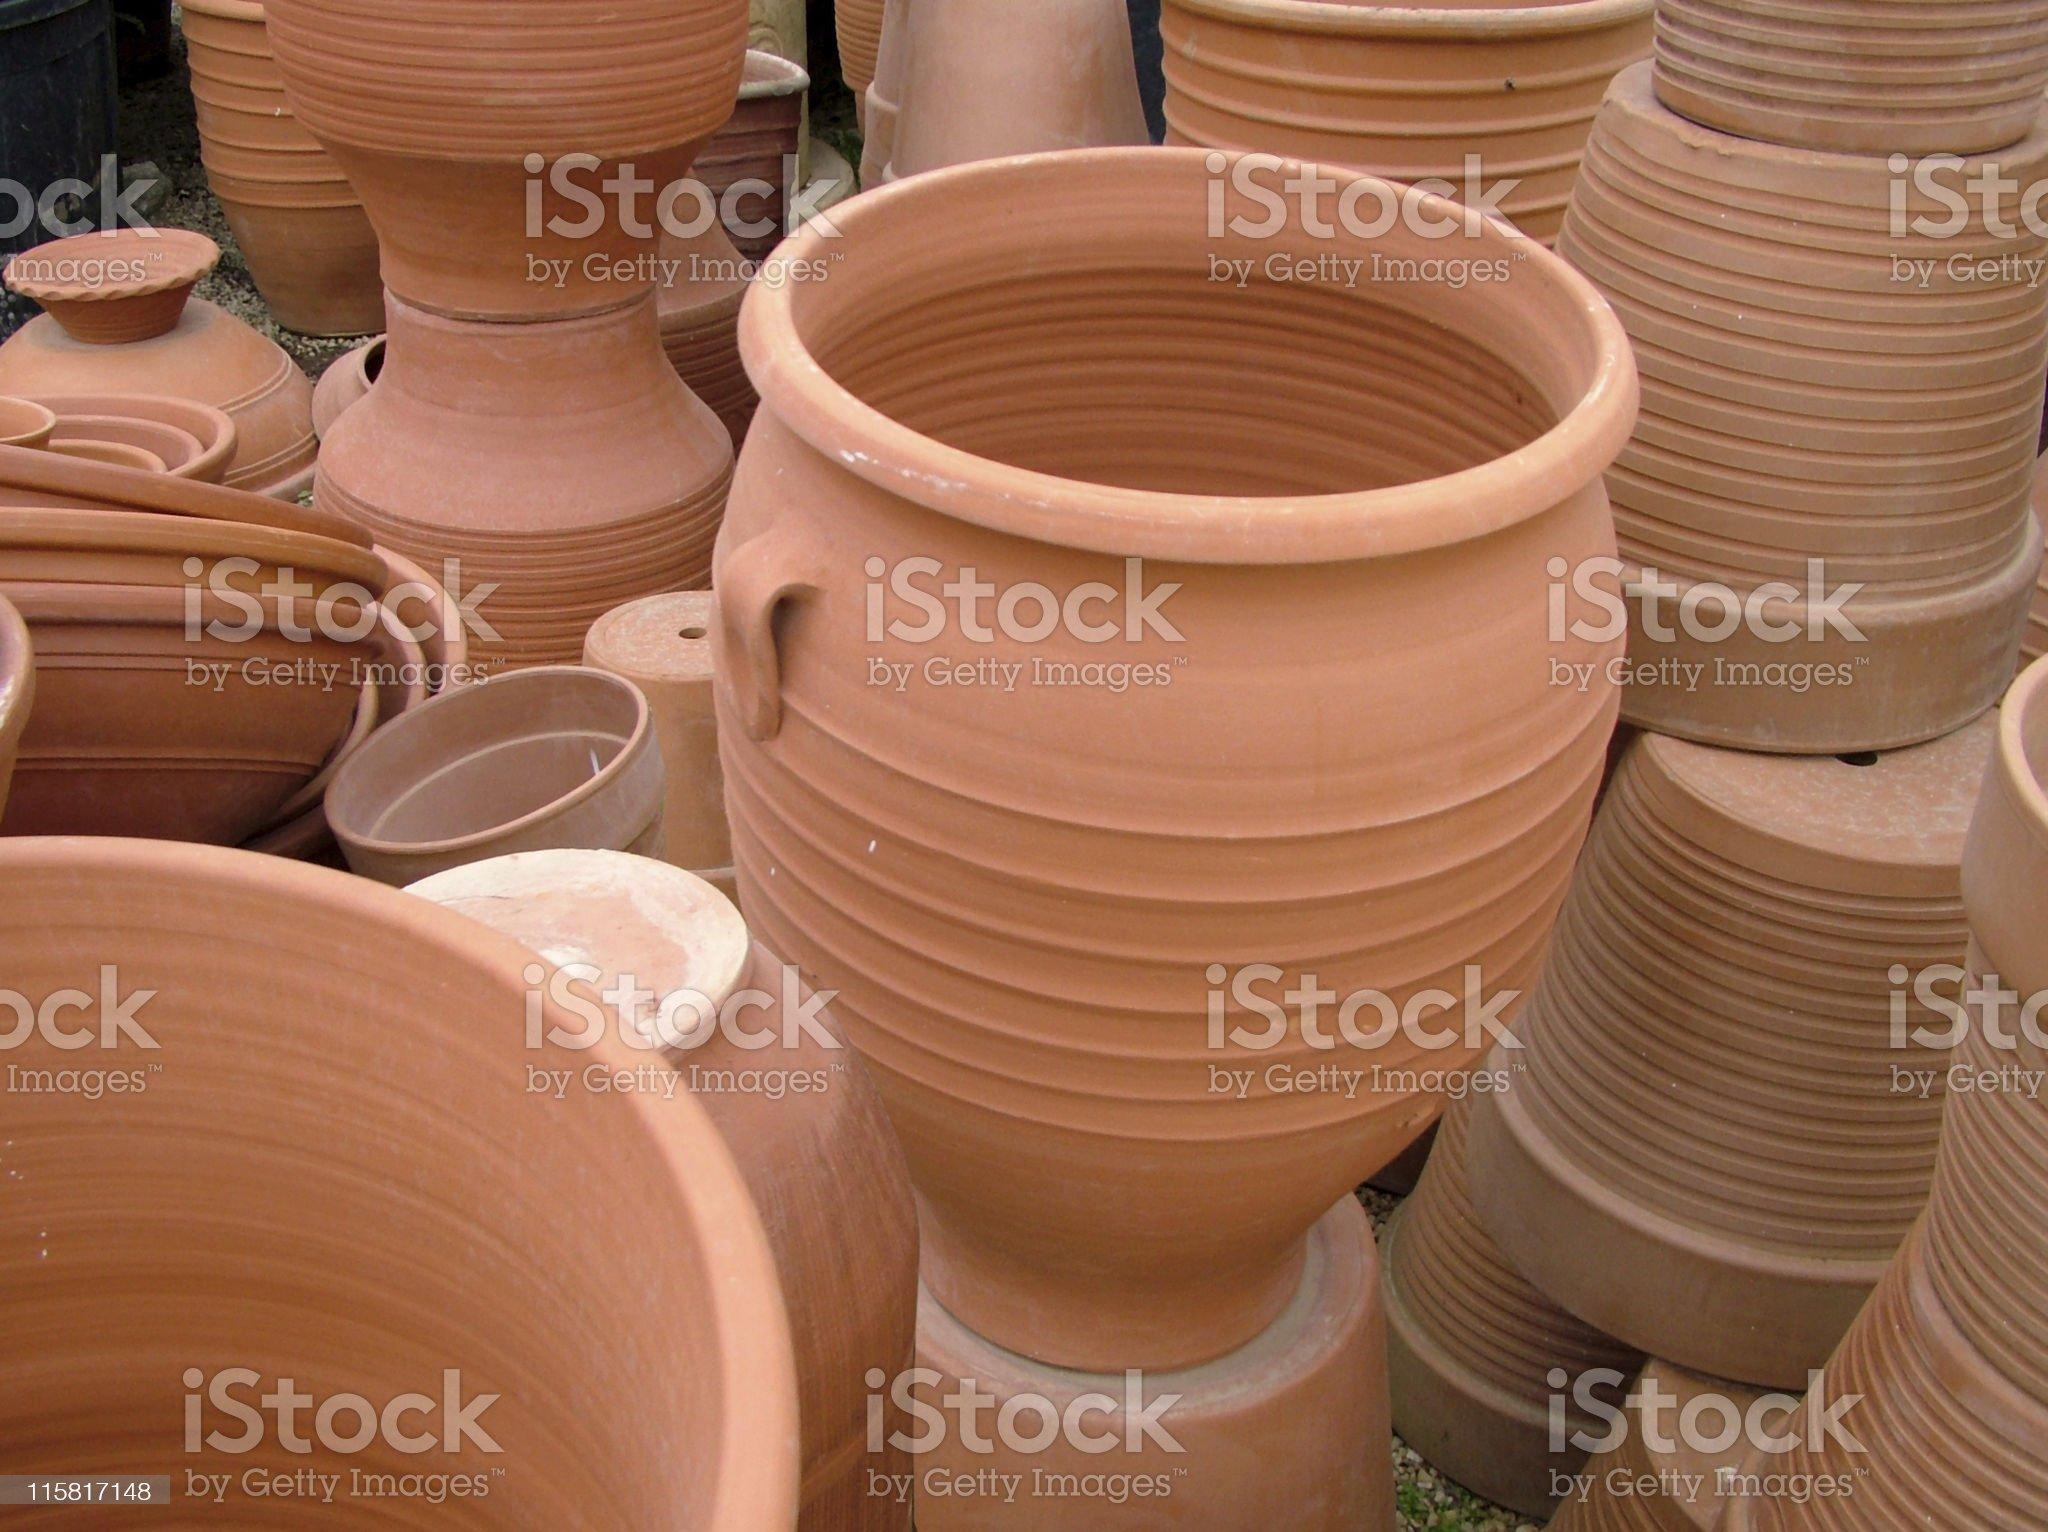 Pottery stuff royalty-free stock photo